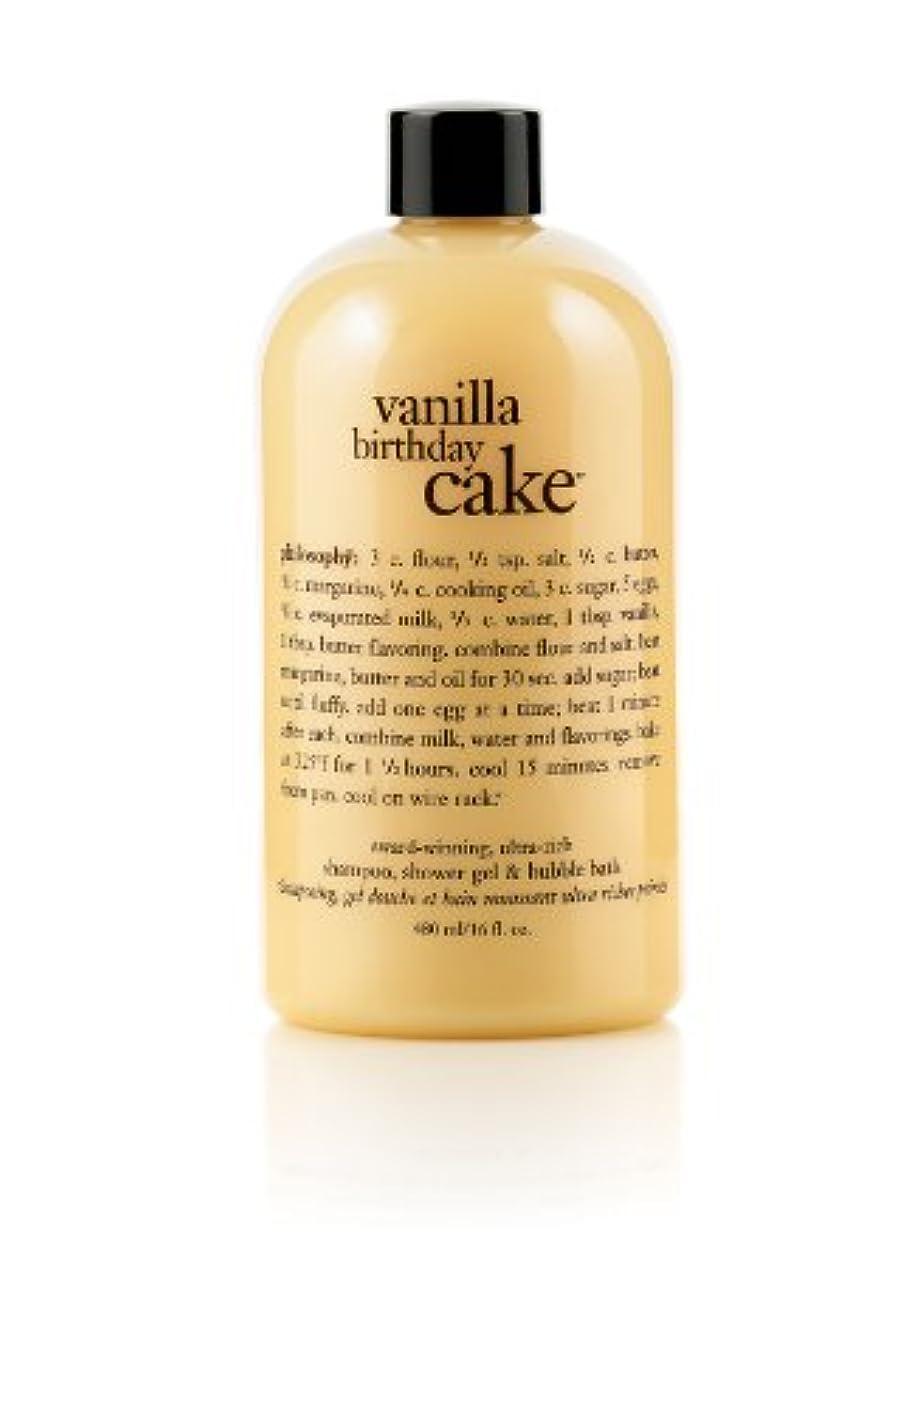 真空教義韓国語Philosophy Vanilla Birthday Cake Shampoo, Shower Gel & Bubble Bath (並行輸入品)